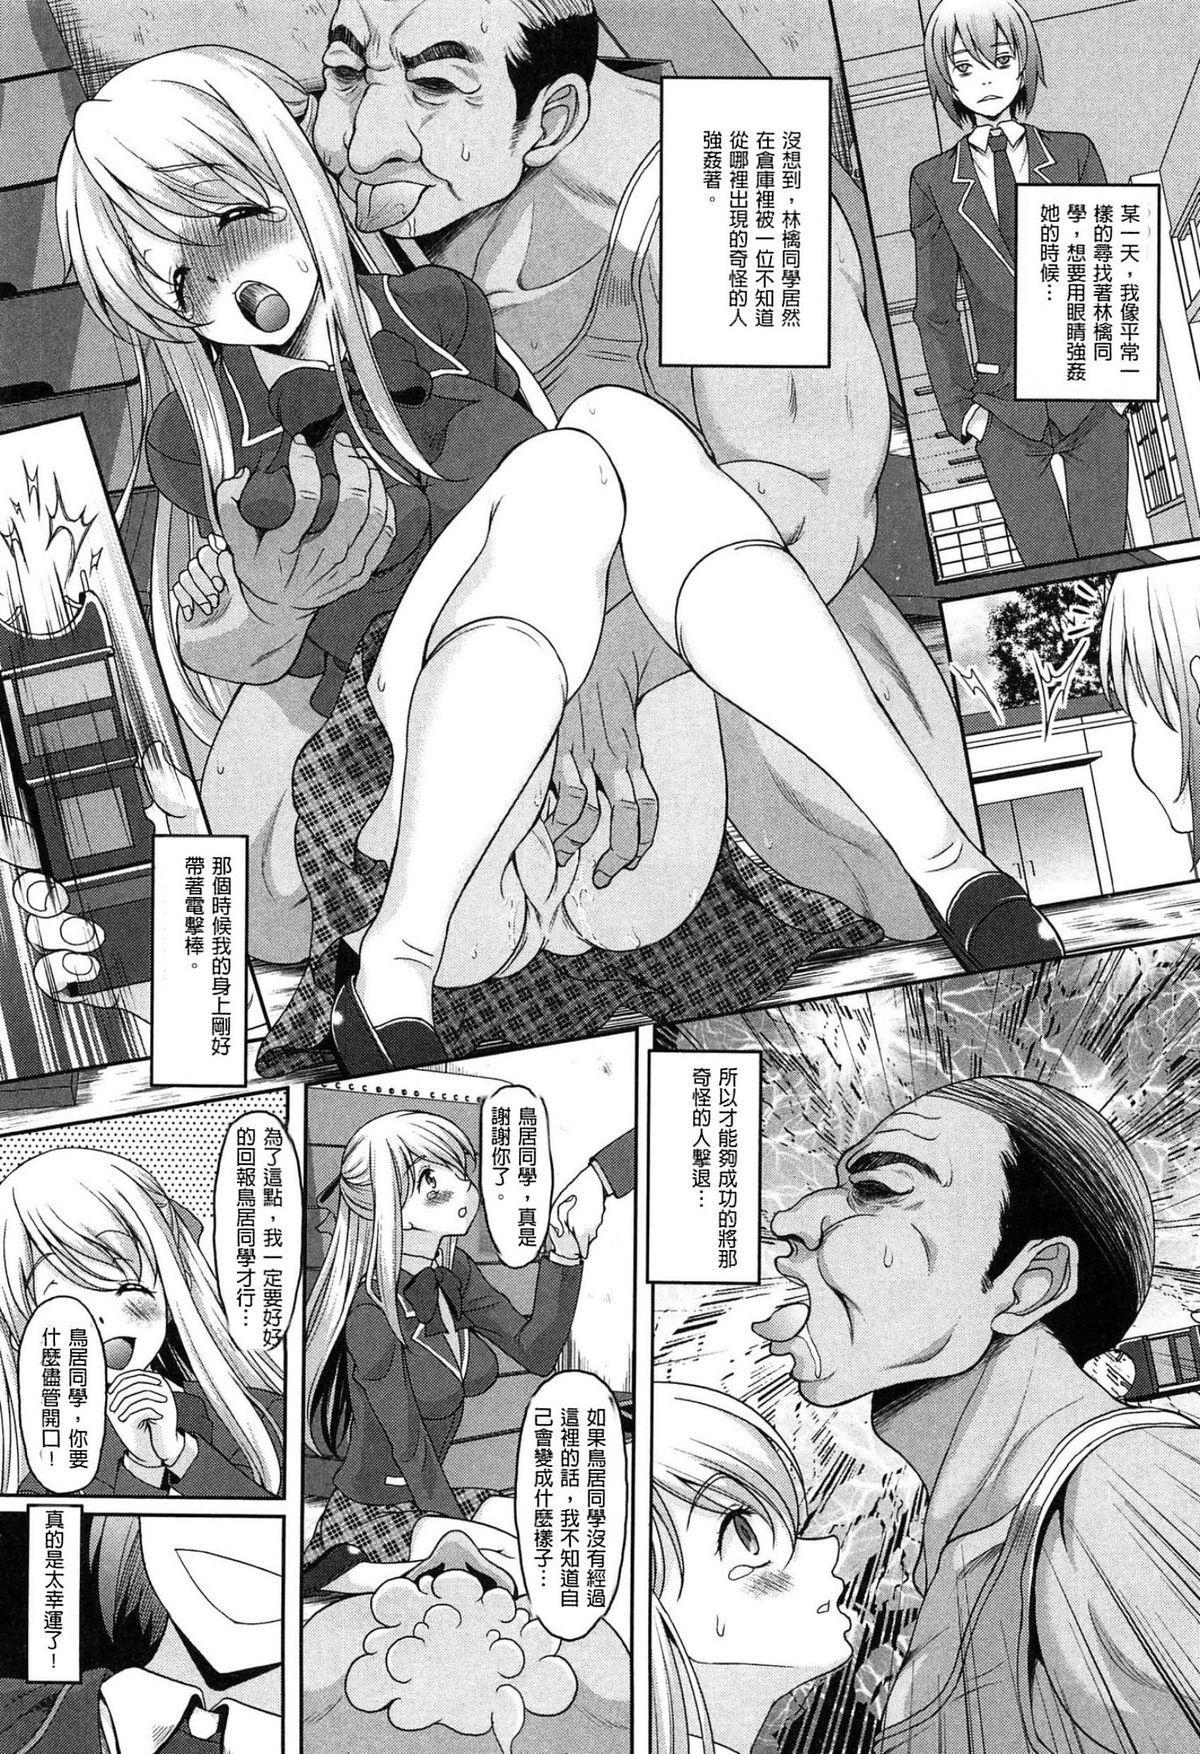 Hajimete nan dakara - First sexual experience 30